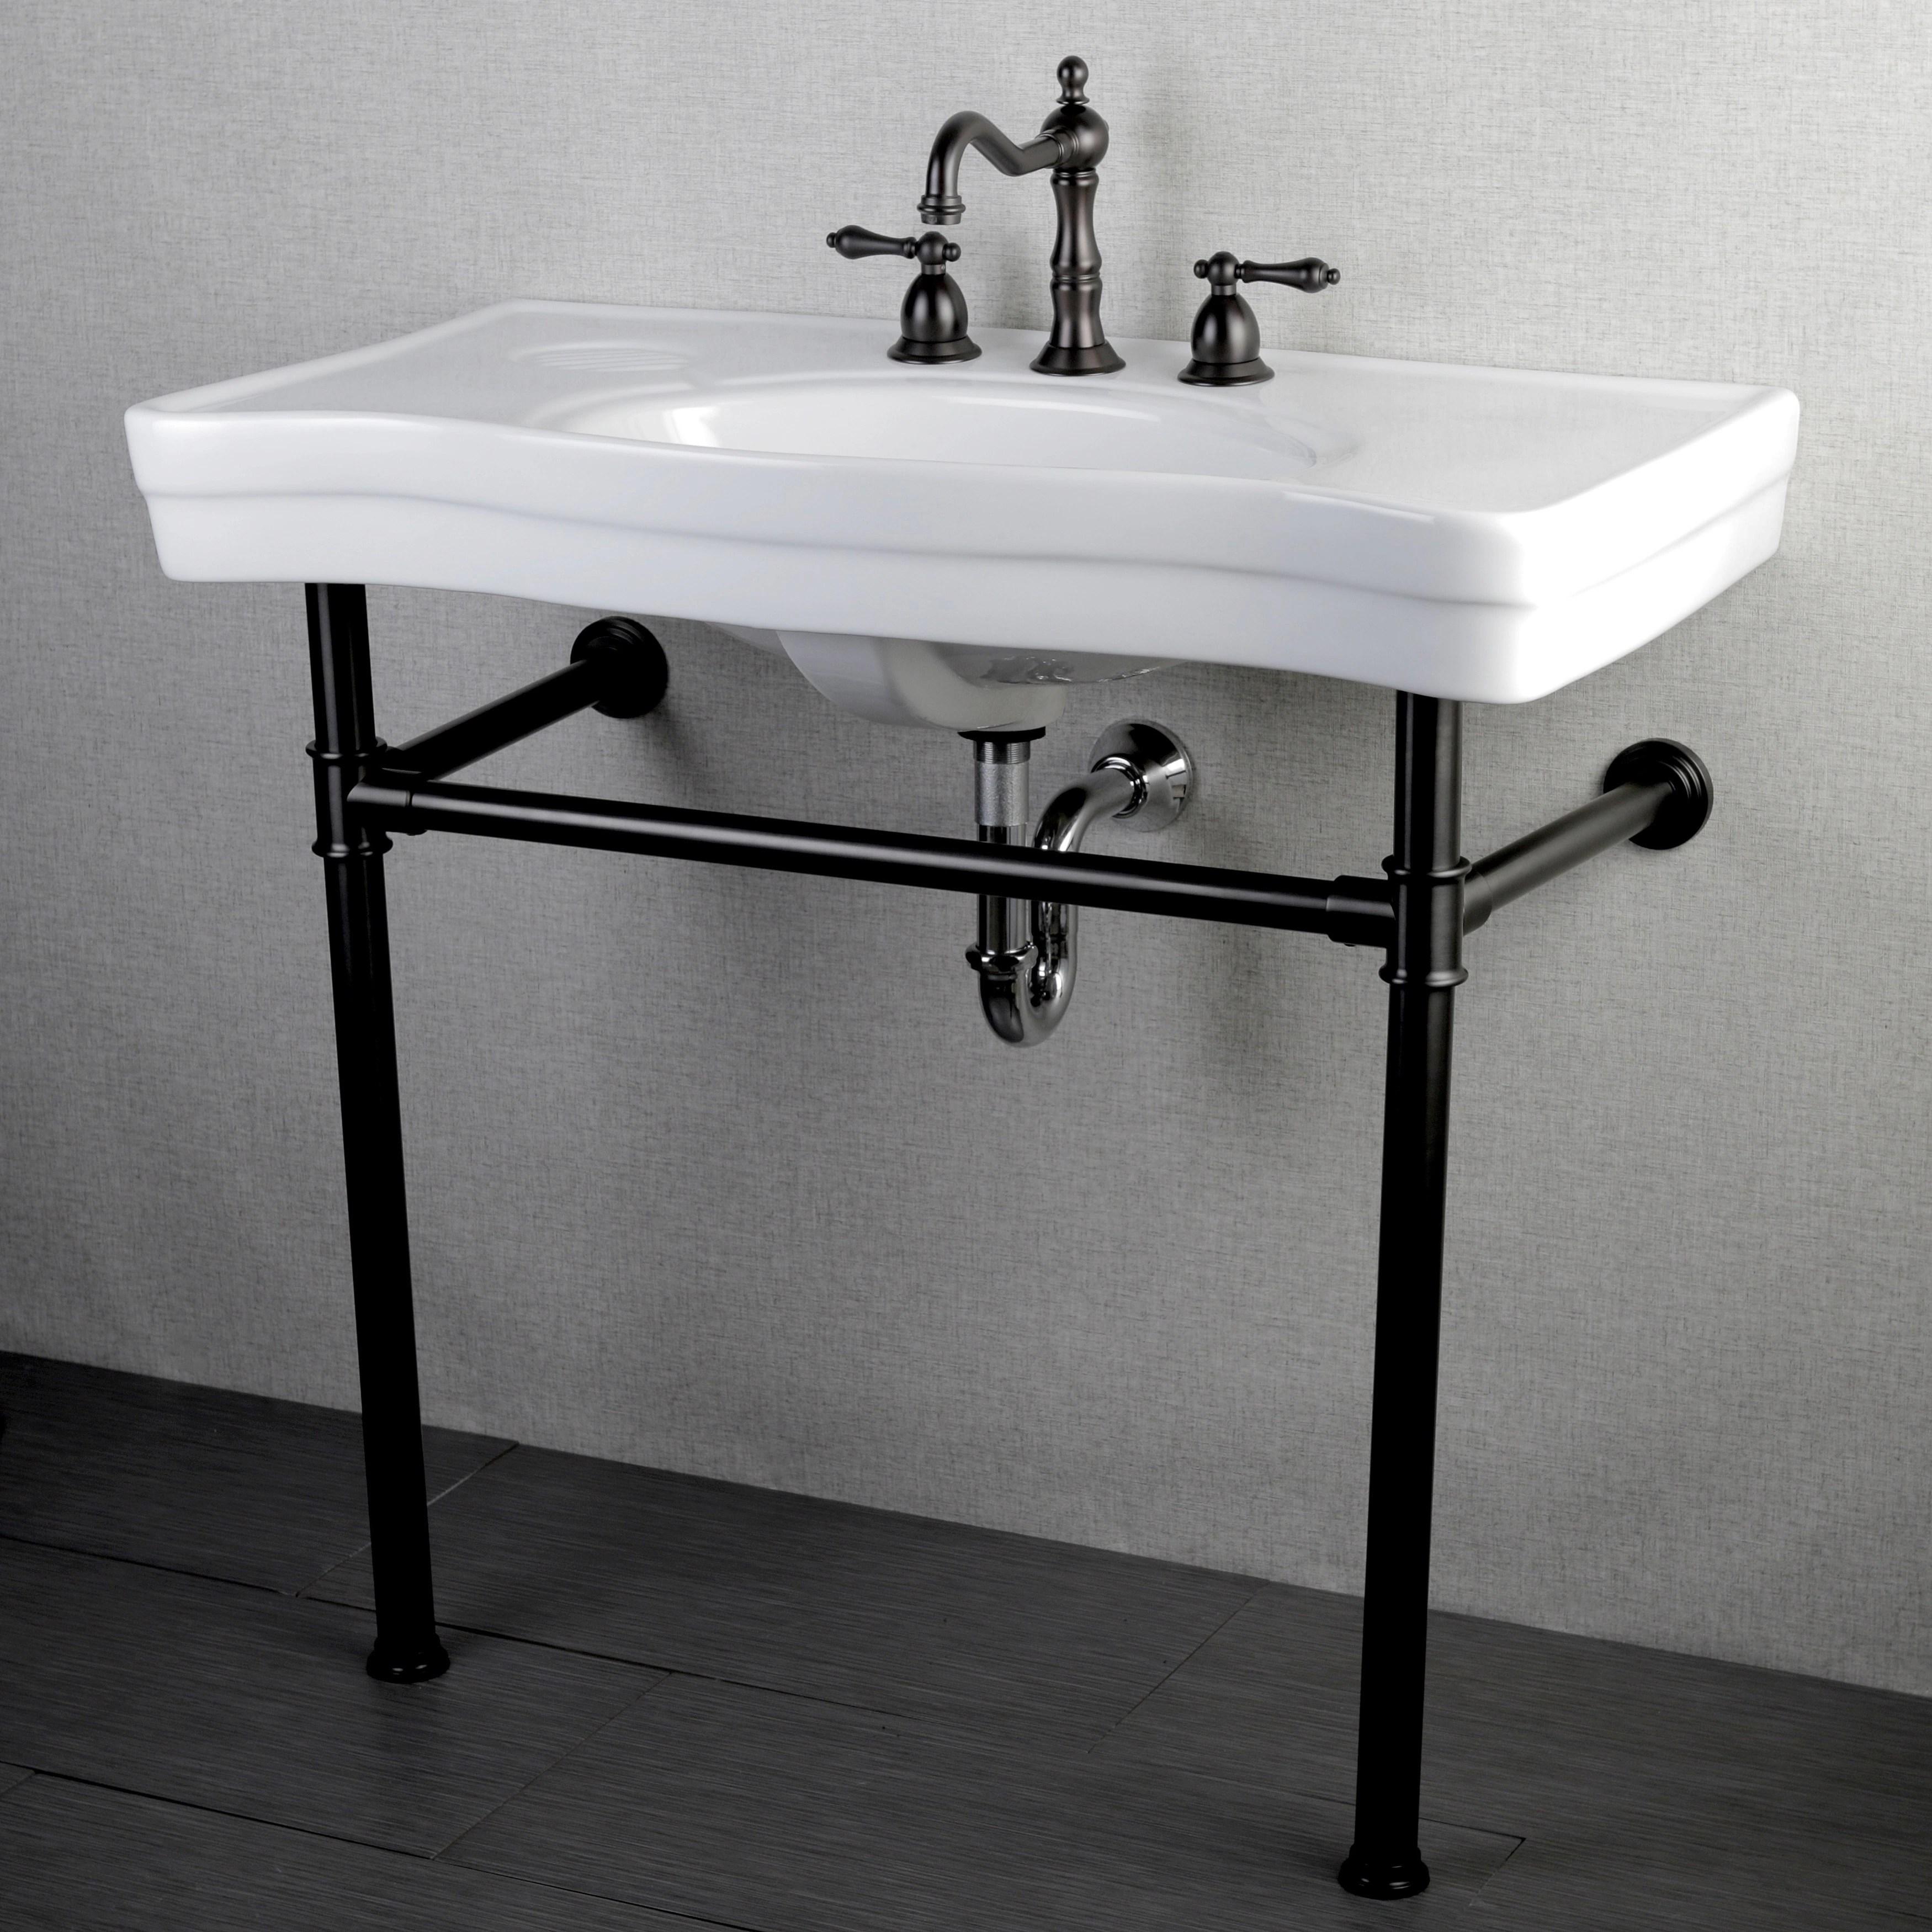 imperial vintage 36 inch oil rubbed bronze pedestal bathroom sink